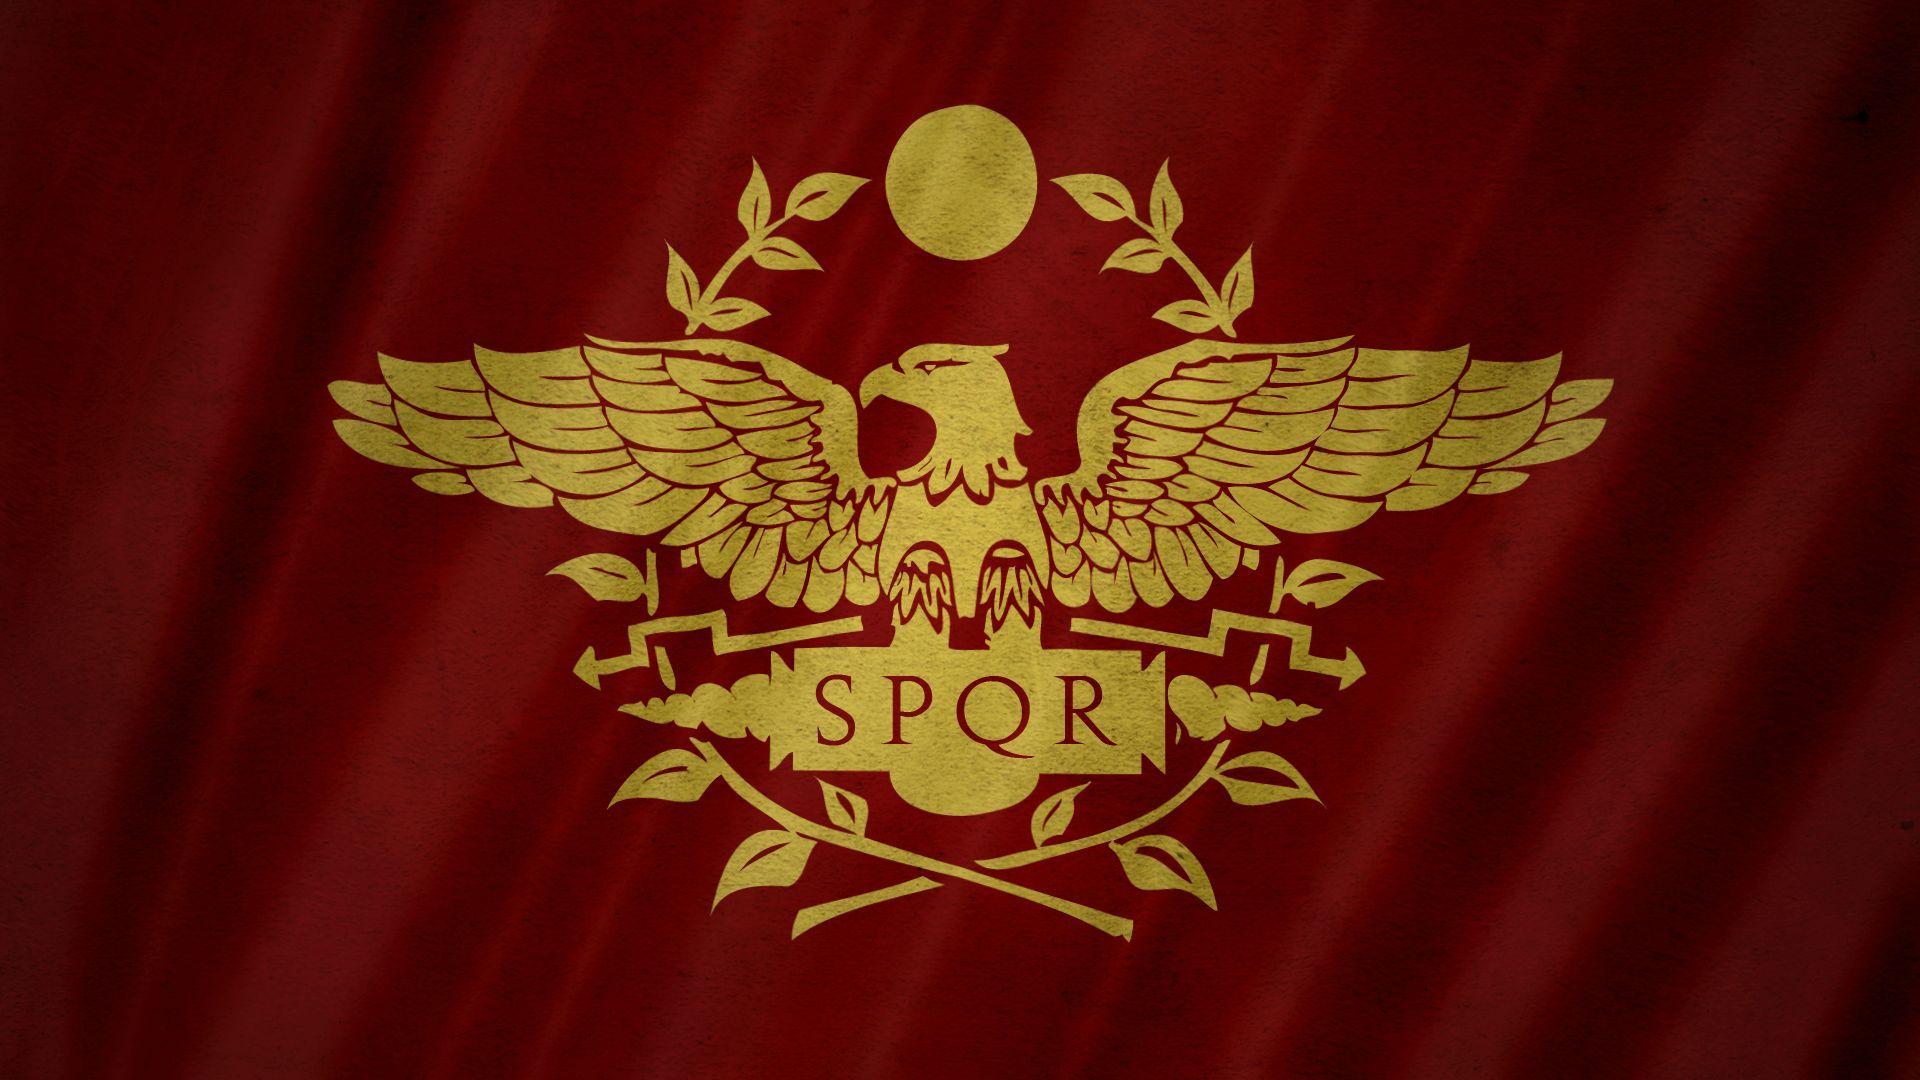 Bn995r1 Jpg 1920 1080 Empire Wallpaper Roman Empire Empire Logo